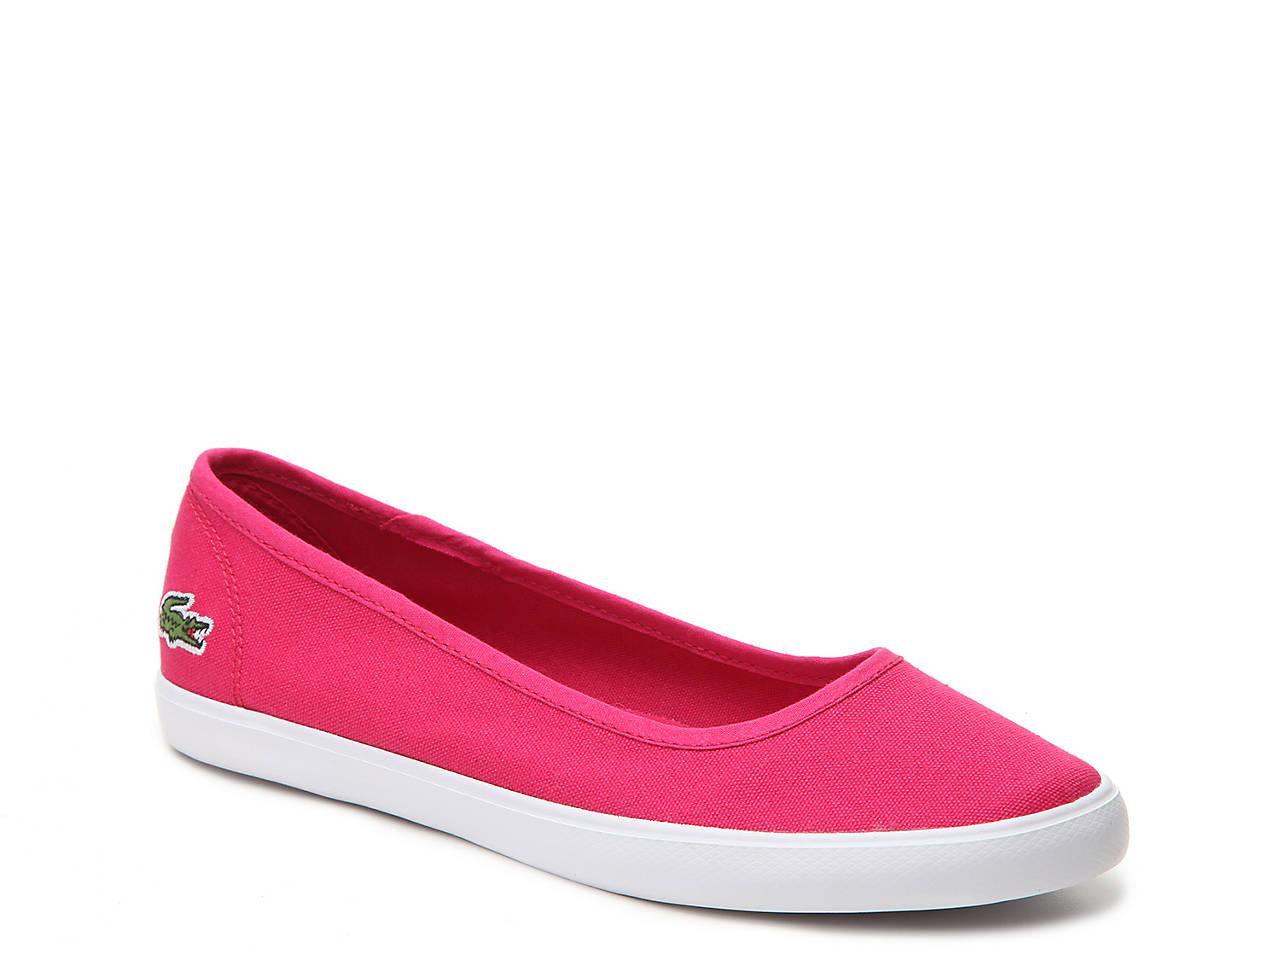 42c9ee482 Lacoste Marthe Sport Flat Women s Shoes